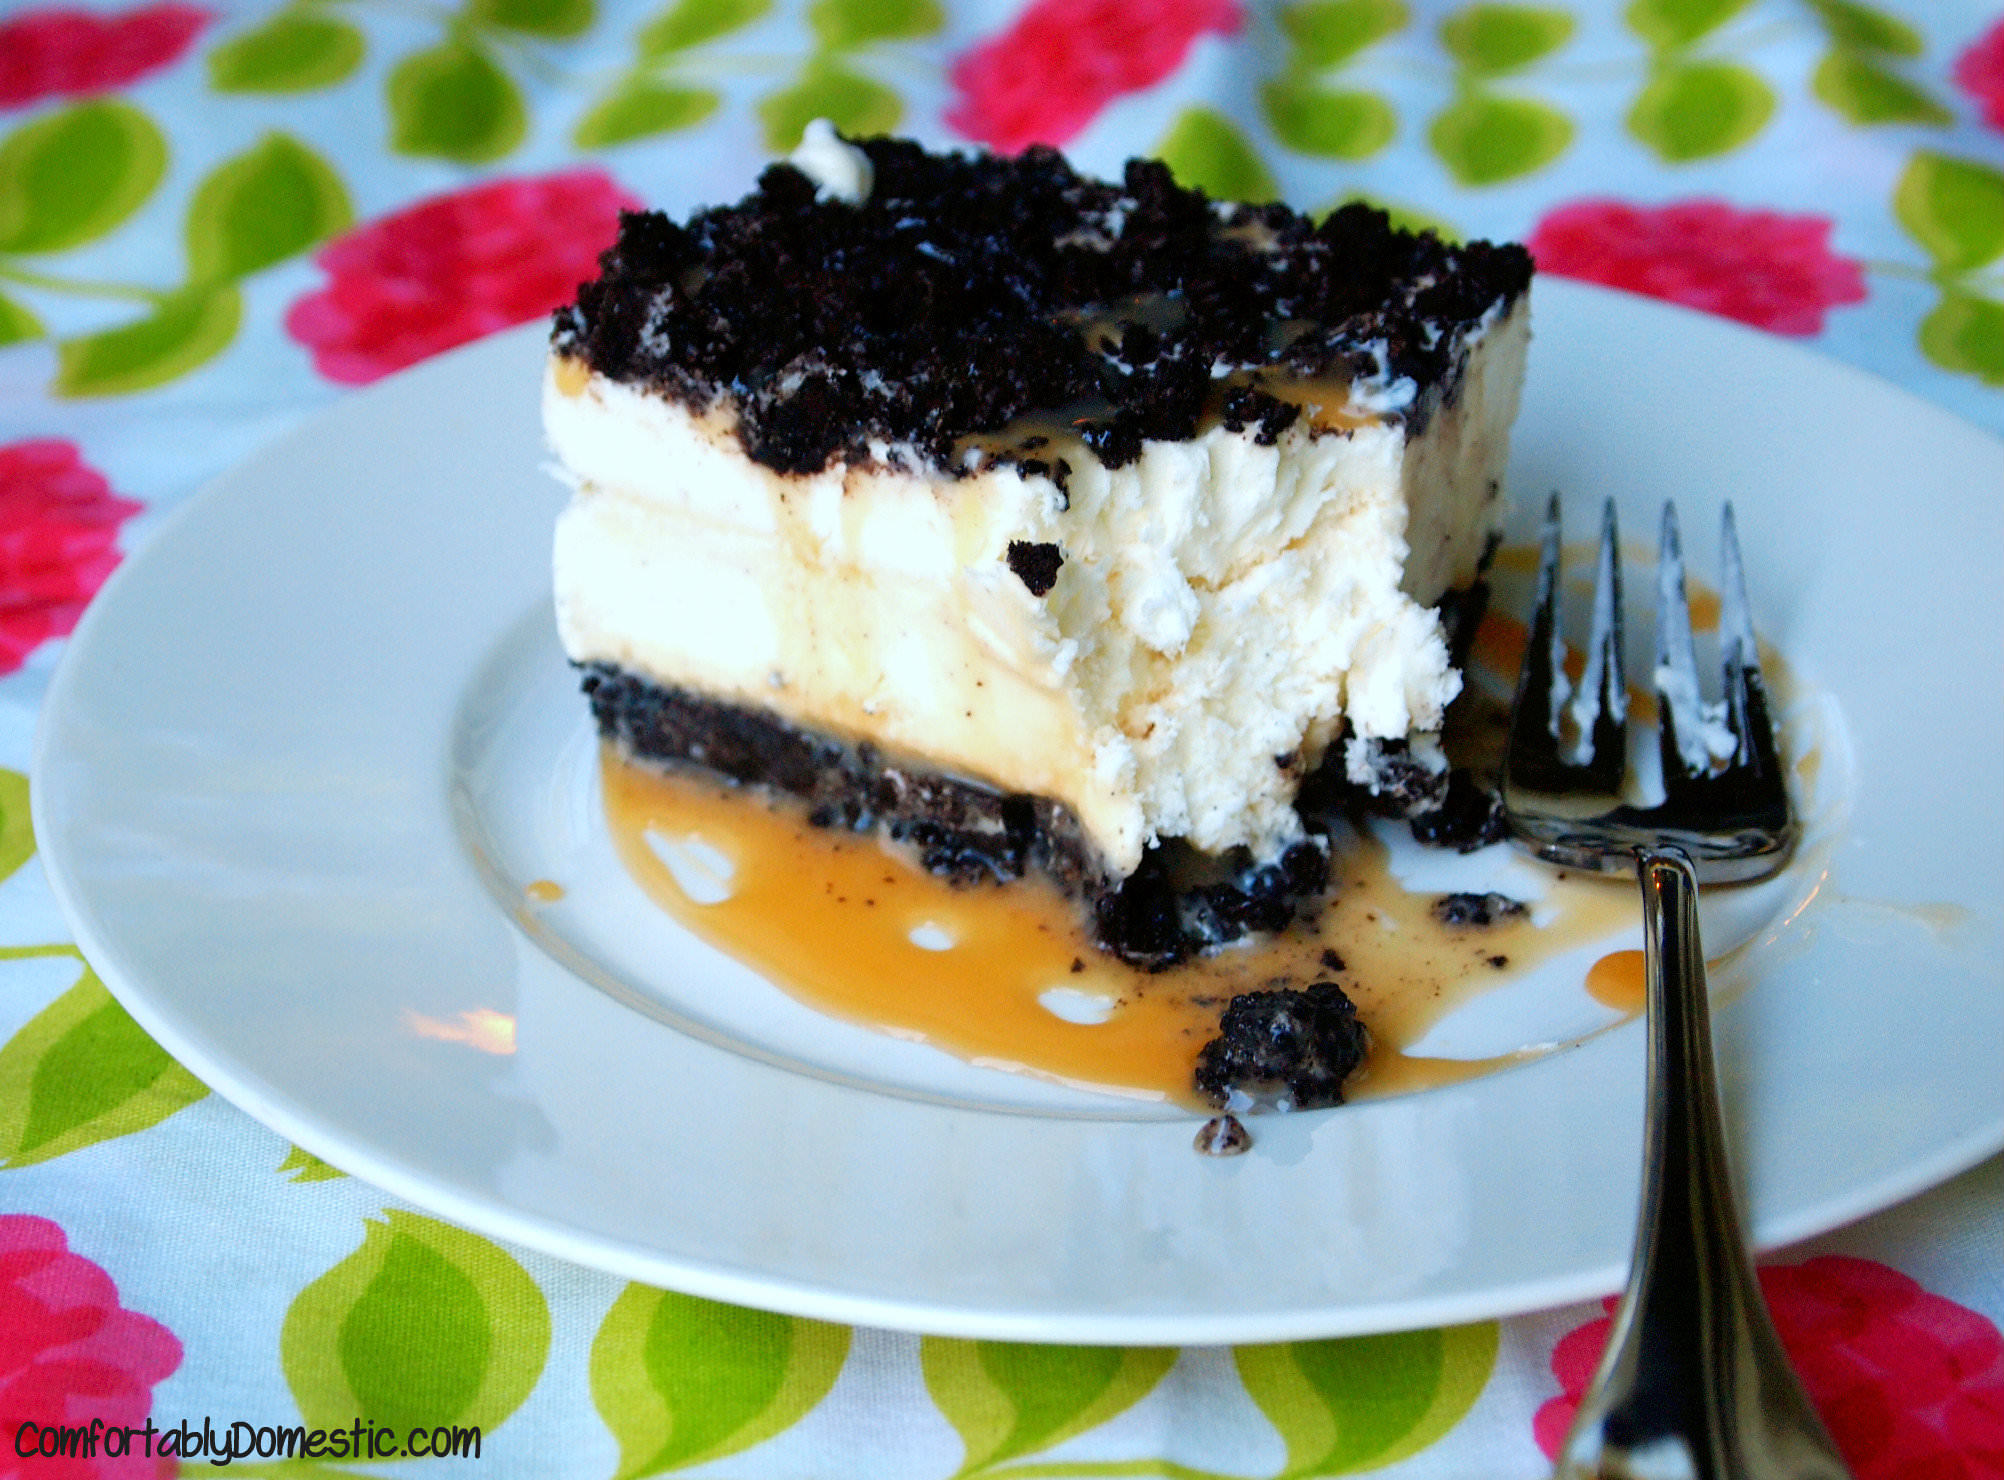 Oreo Ice Cream Cake | ComfortablyDomestic.com